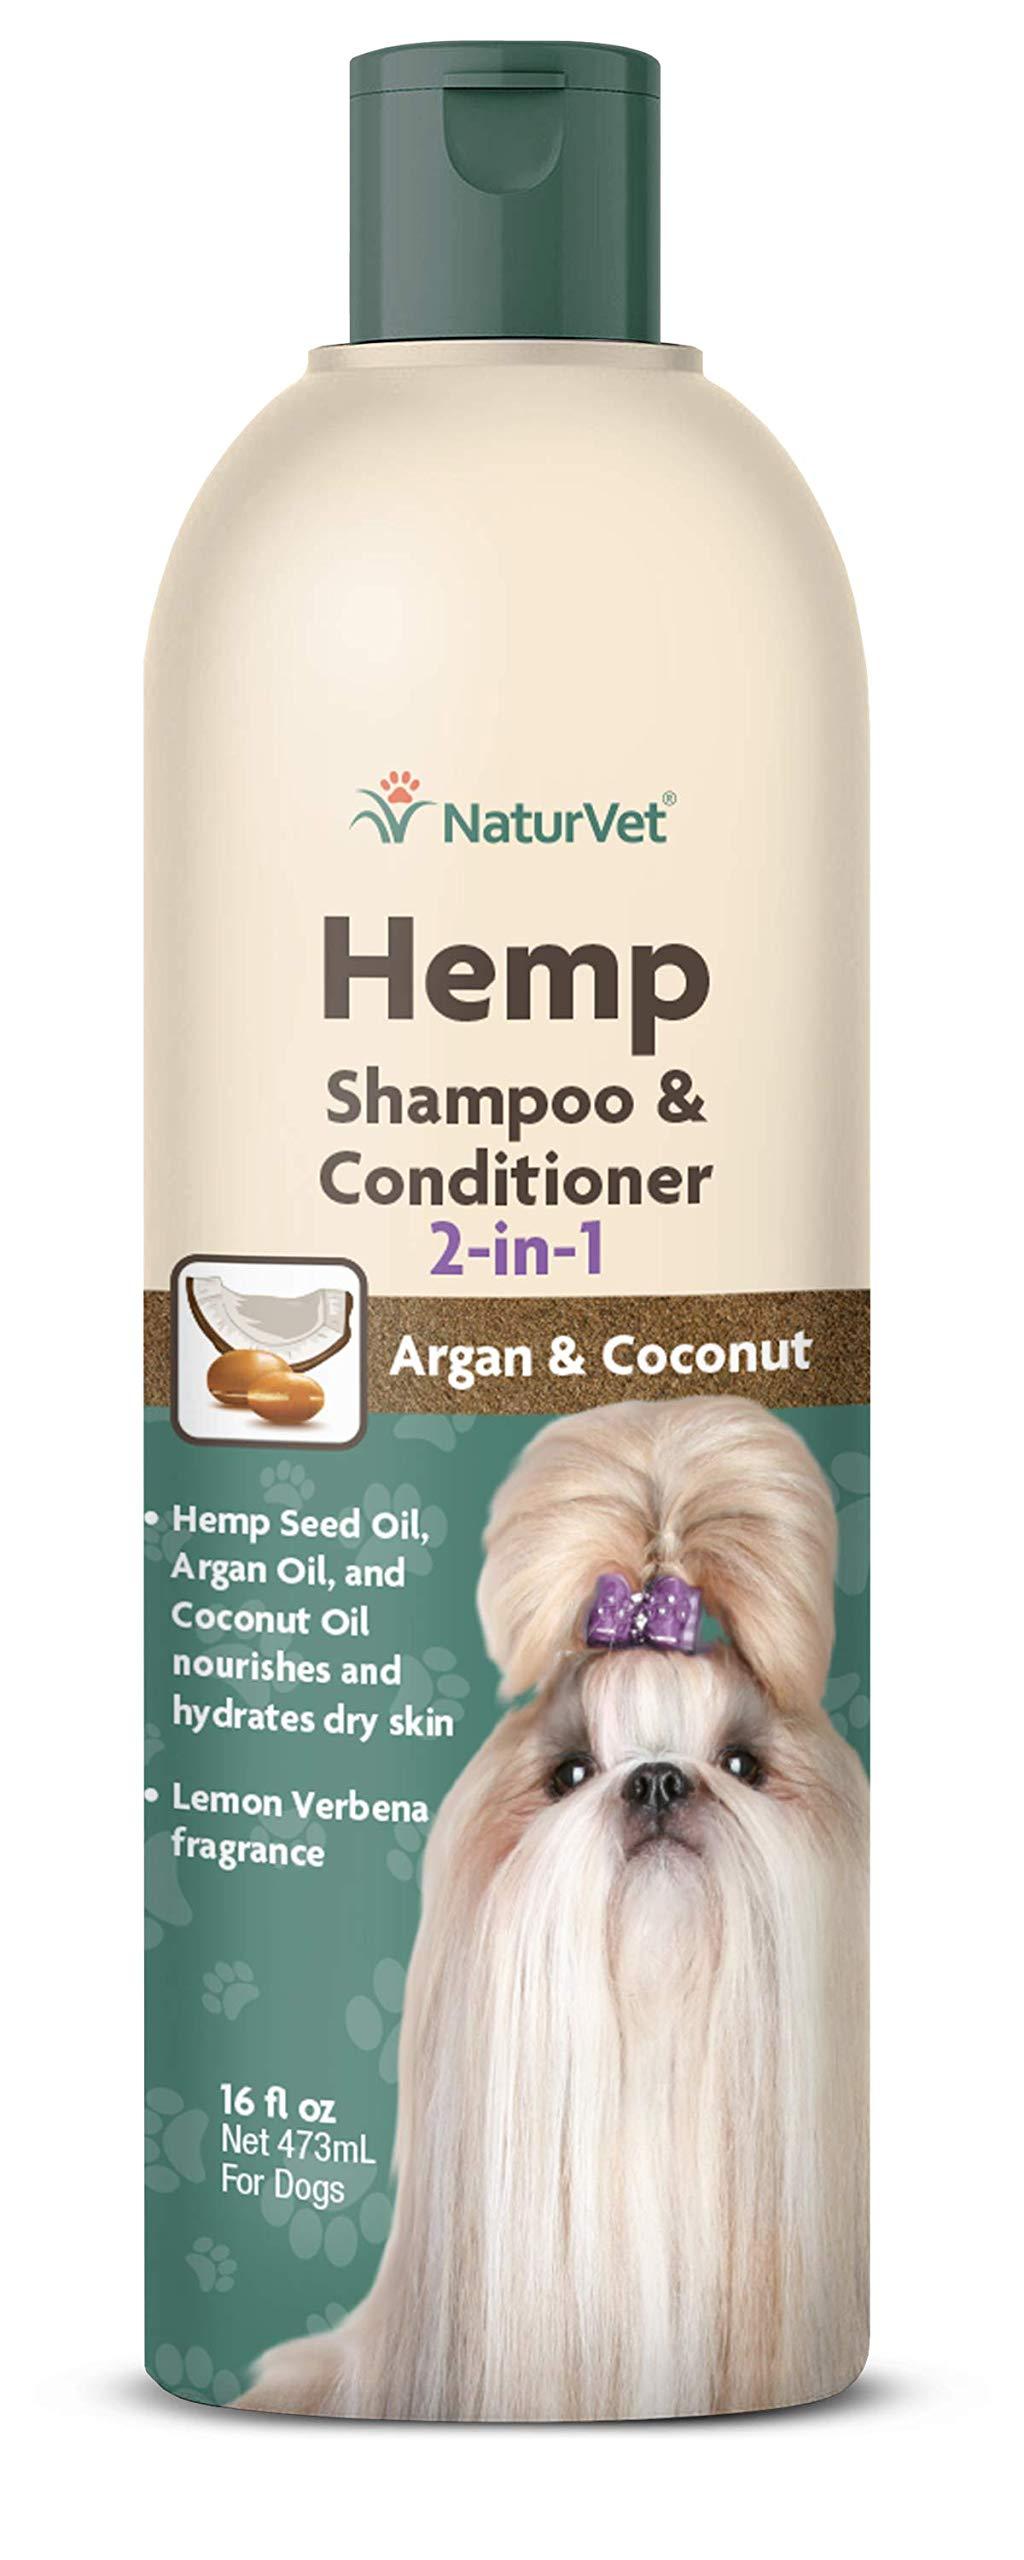 NaturVet – Hemp Shampoo & Conditioner 2-in-1 - Plus Argan & Coconut Oil – 16 oz – Gently Cleanses, Deodorizes & Conditions – Enhanced with Hemp Seed Oil, Argan Oil, Coconut Oil, & Aloe Vera